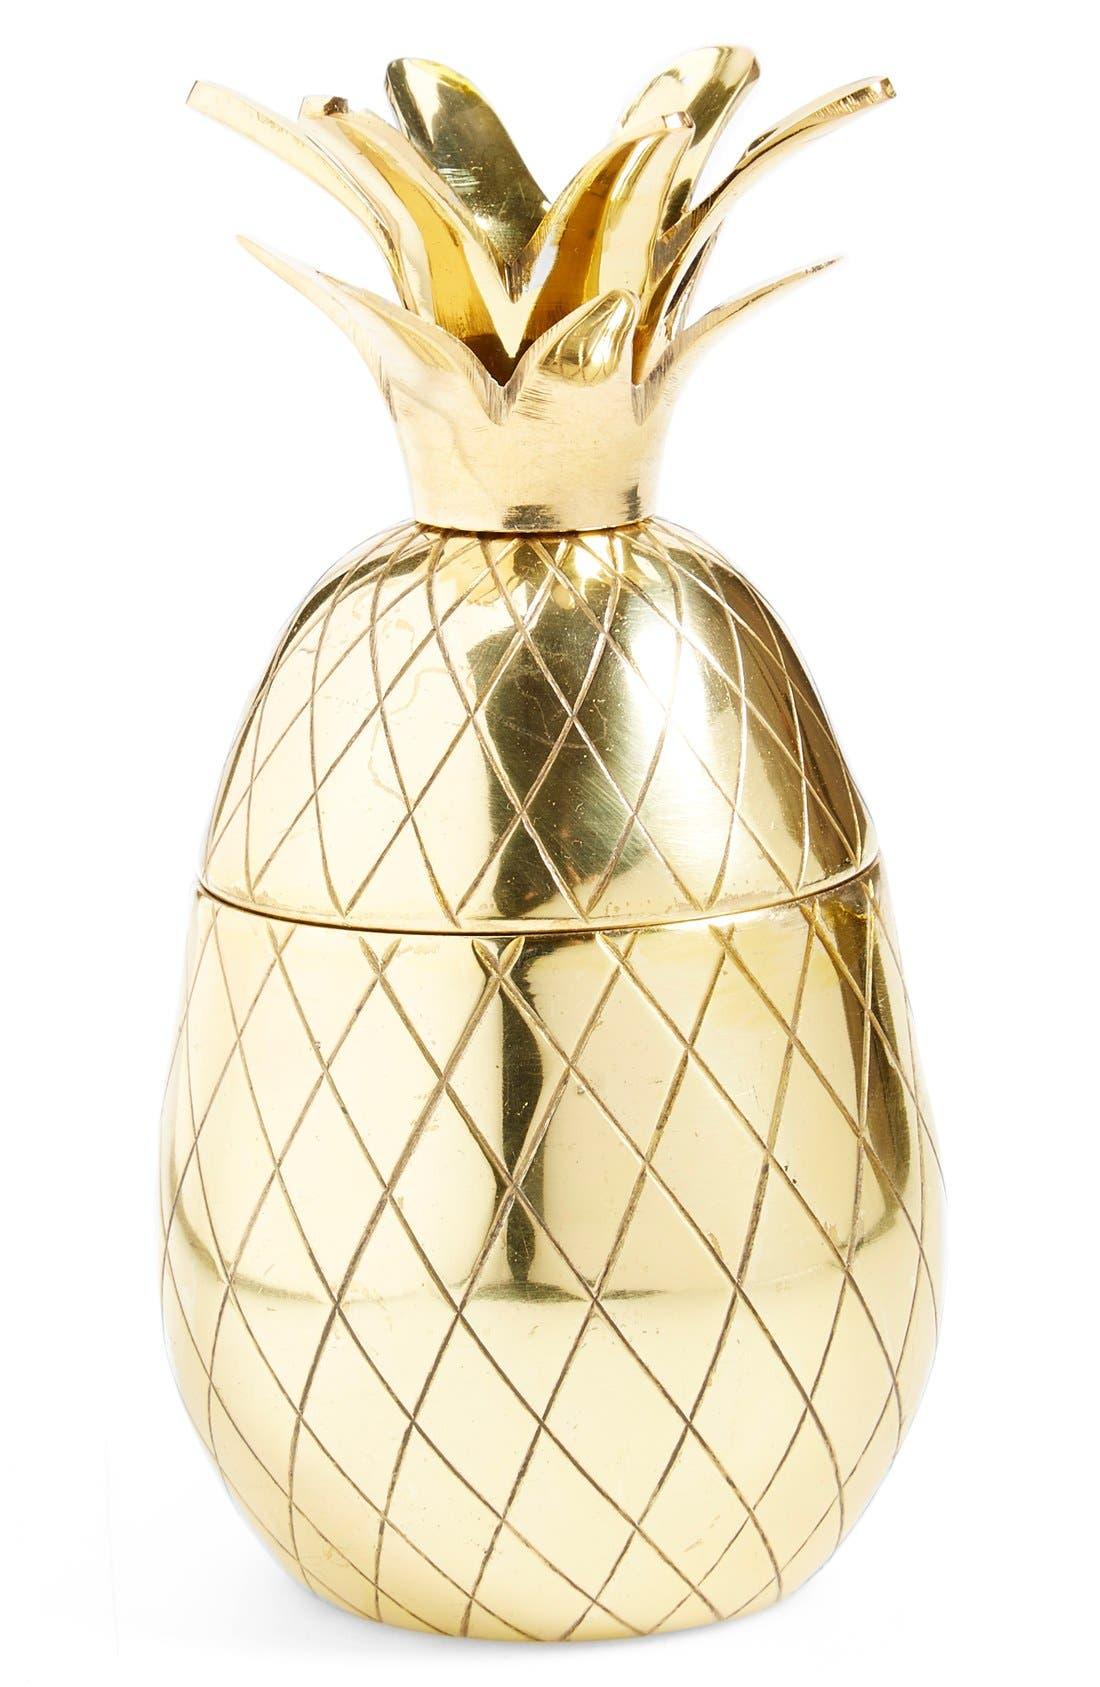 Main Image - W&P DESIGN Pineapple Tumbler